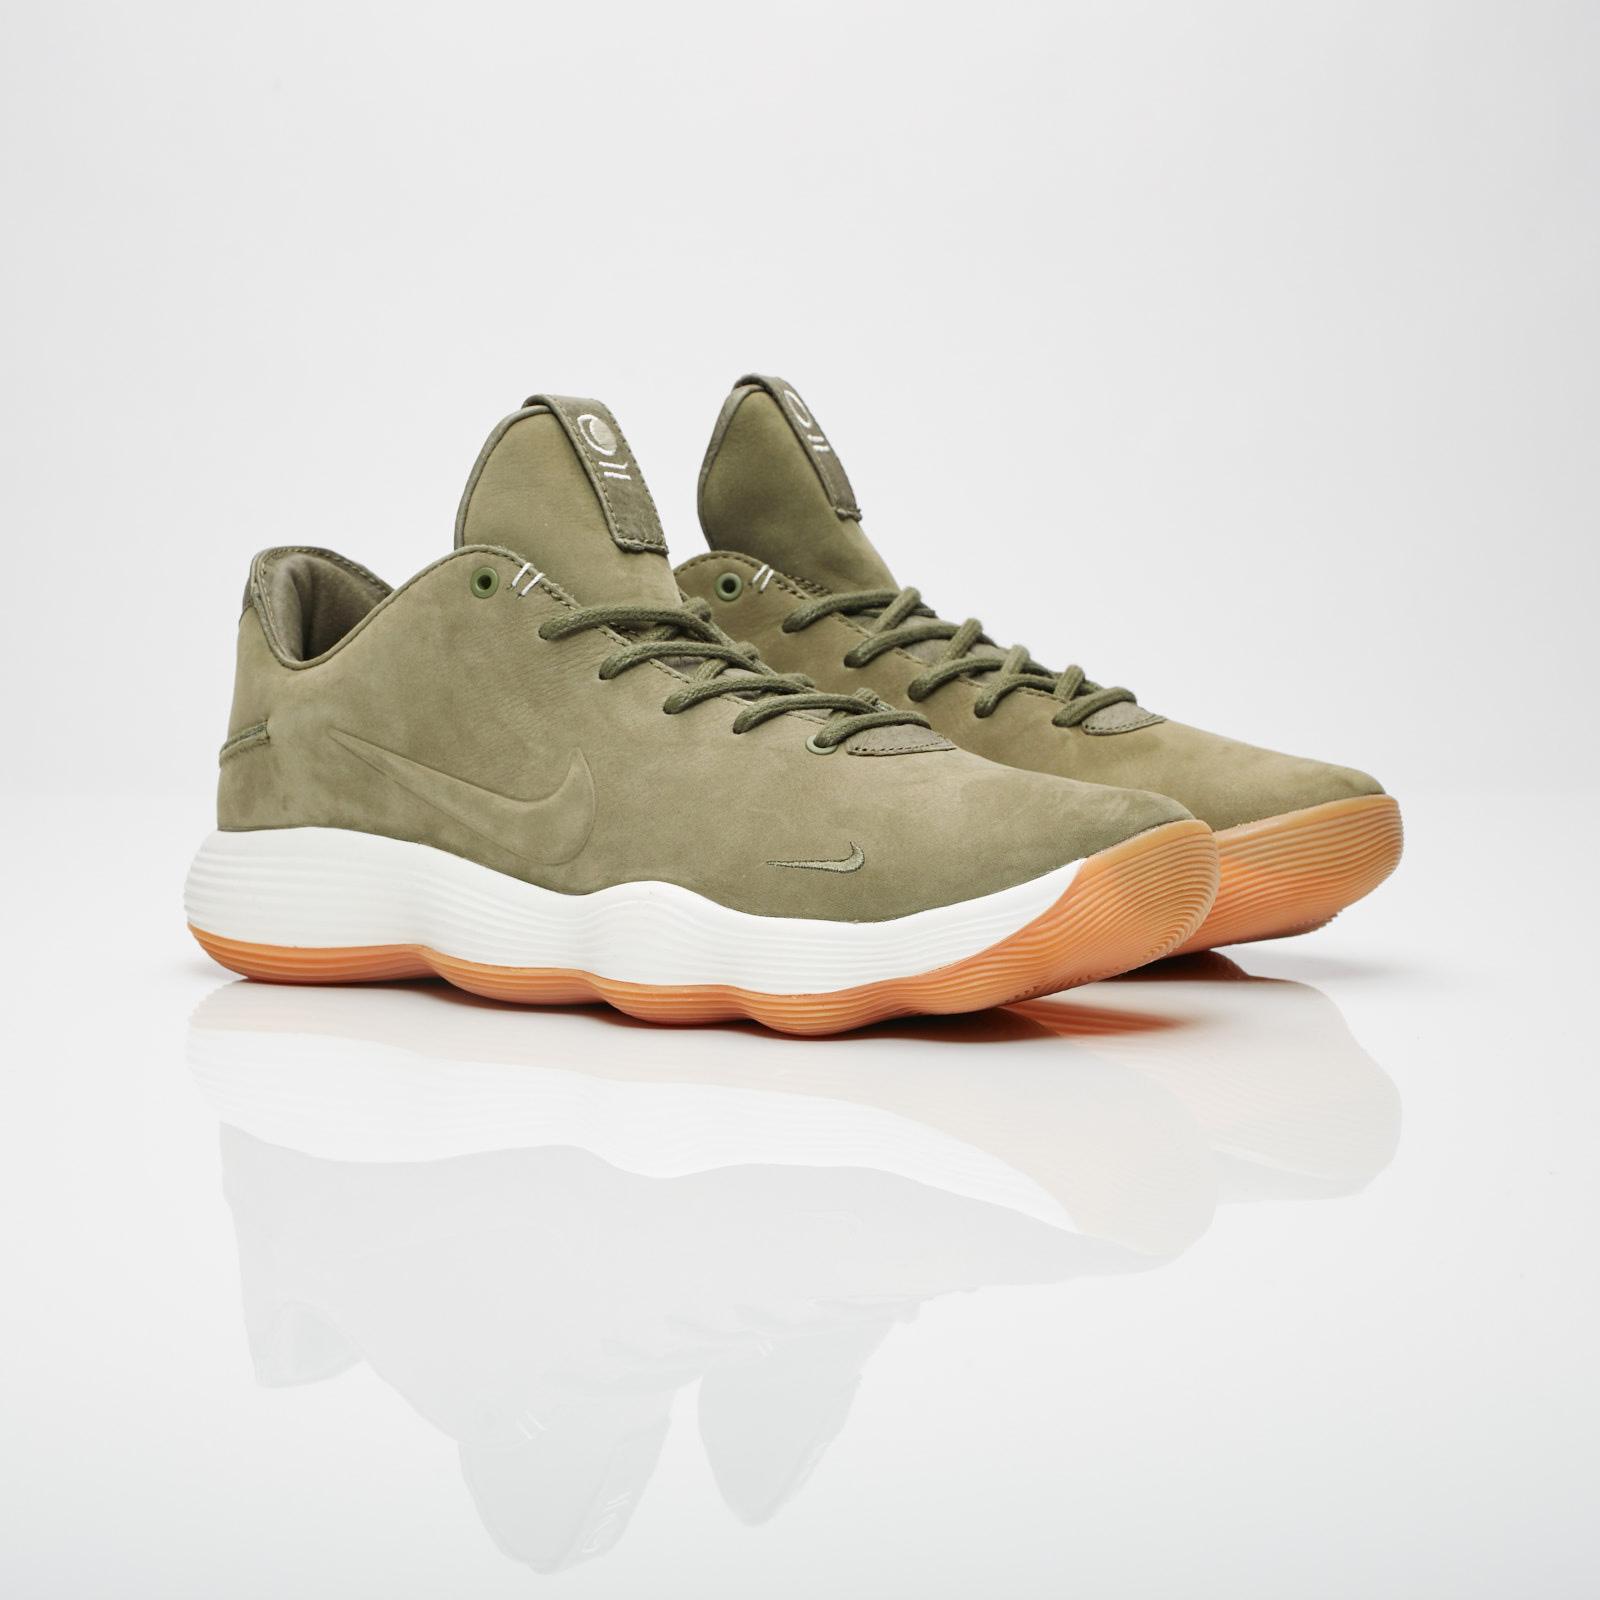 0d22bd3b5c33 Nike Hyperdunk 2017 Low LMTD - 897636-902 - Sneakersnstuff ...